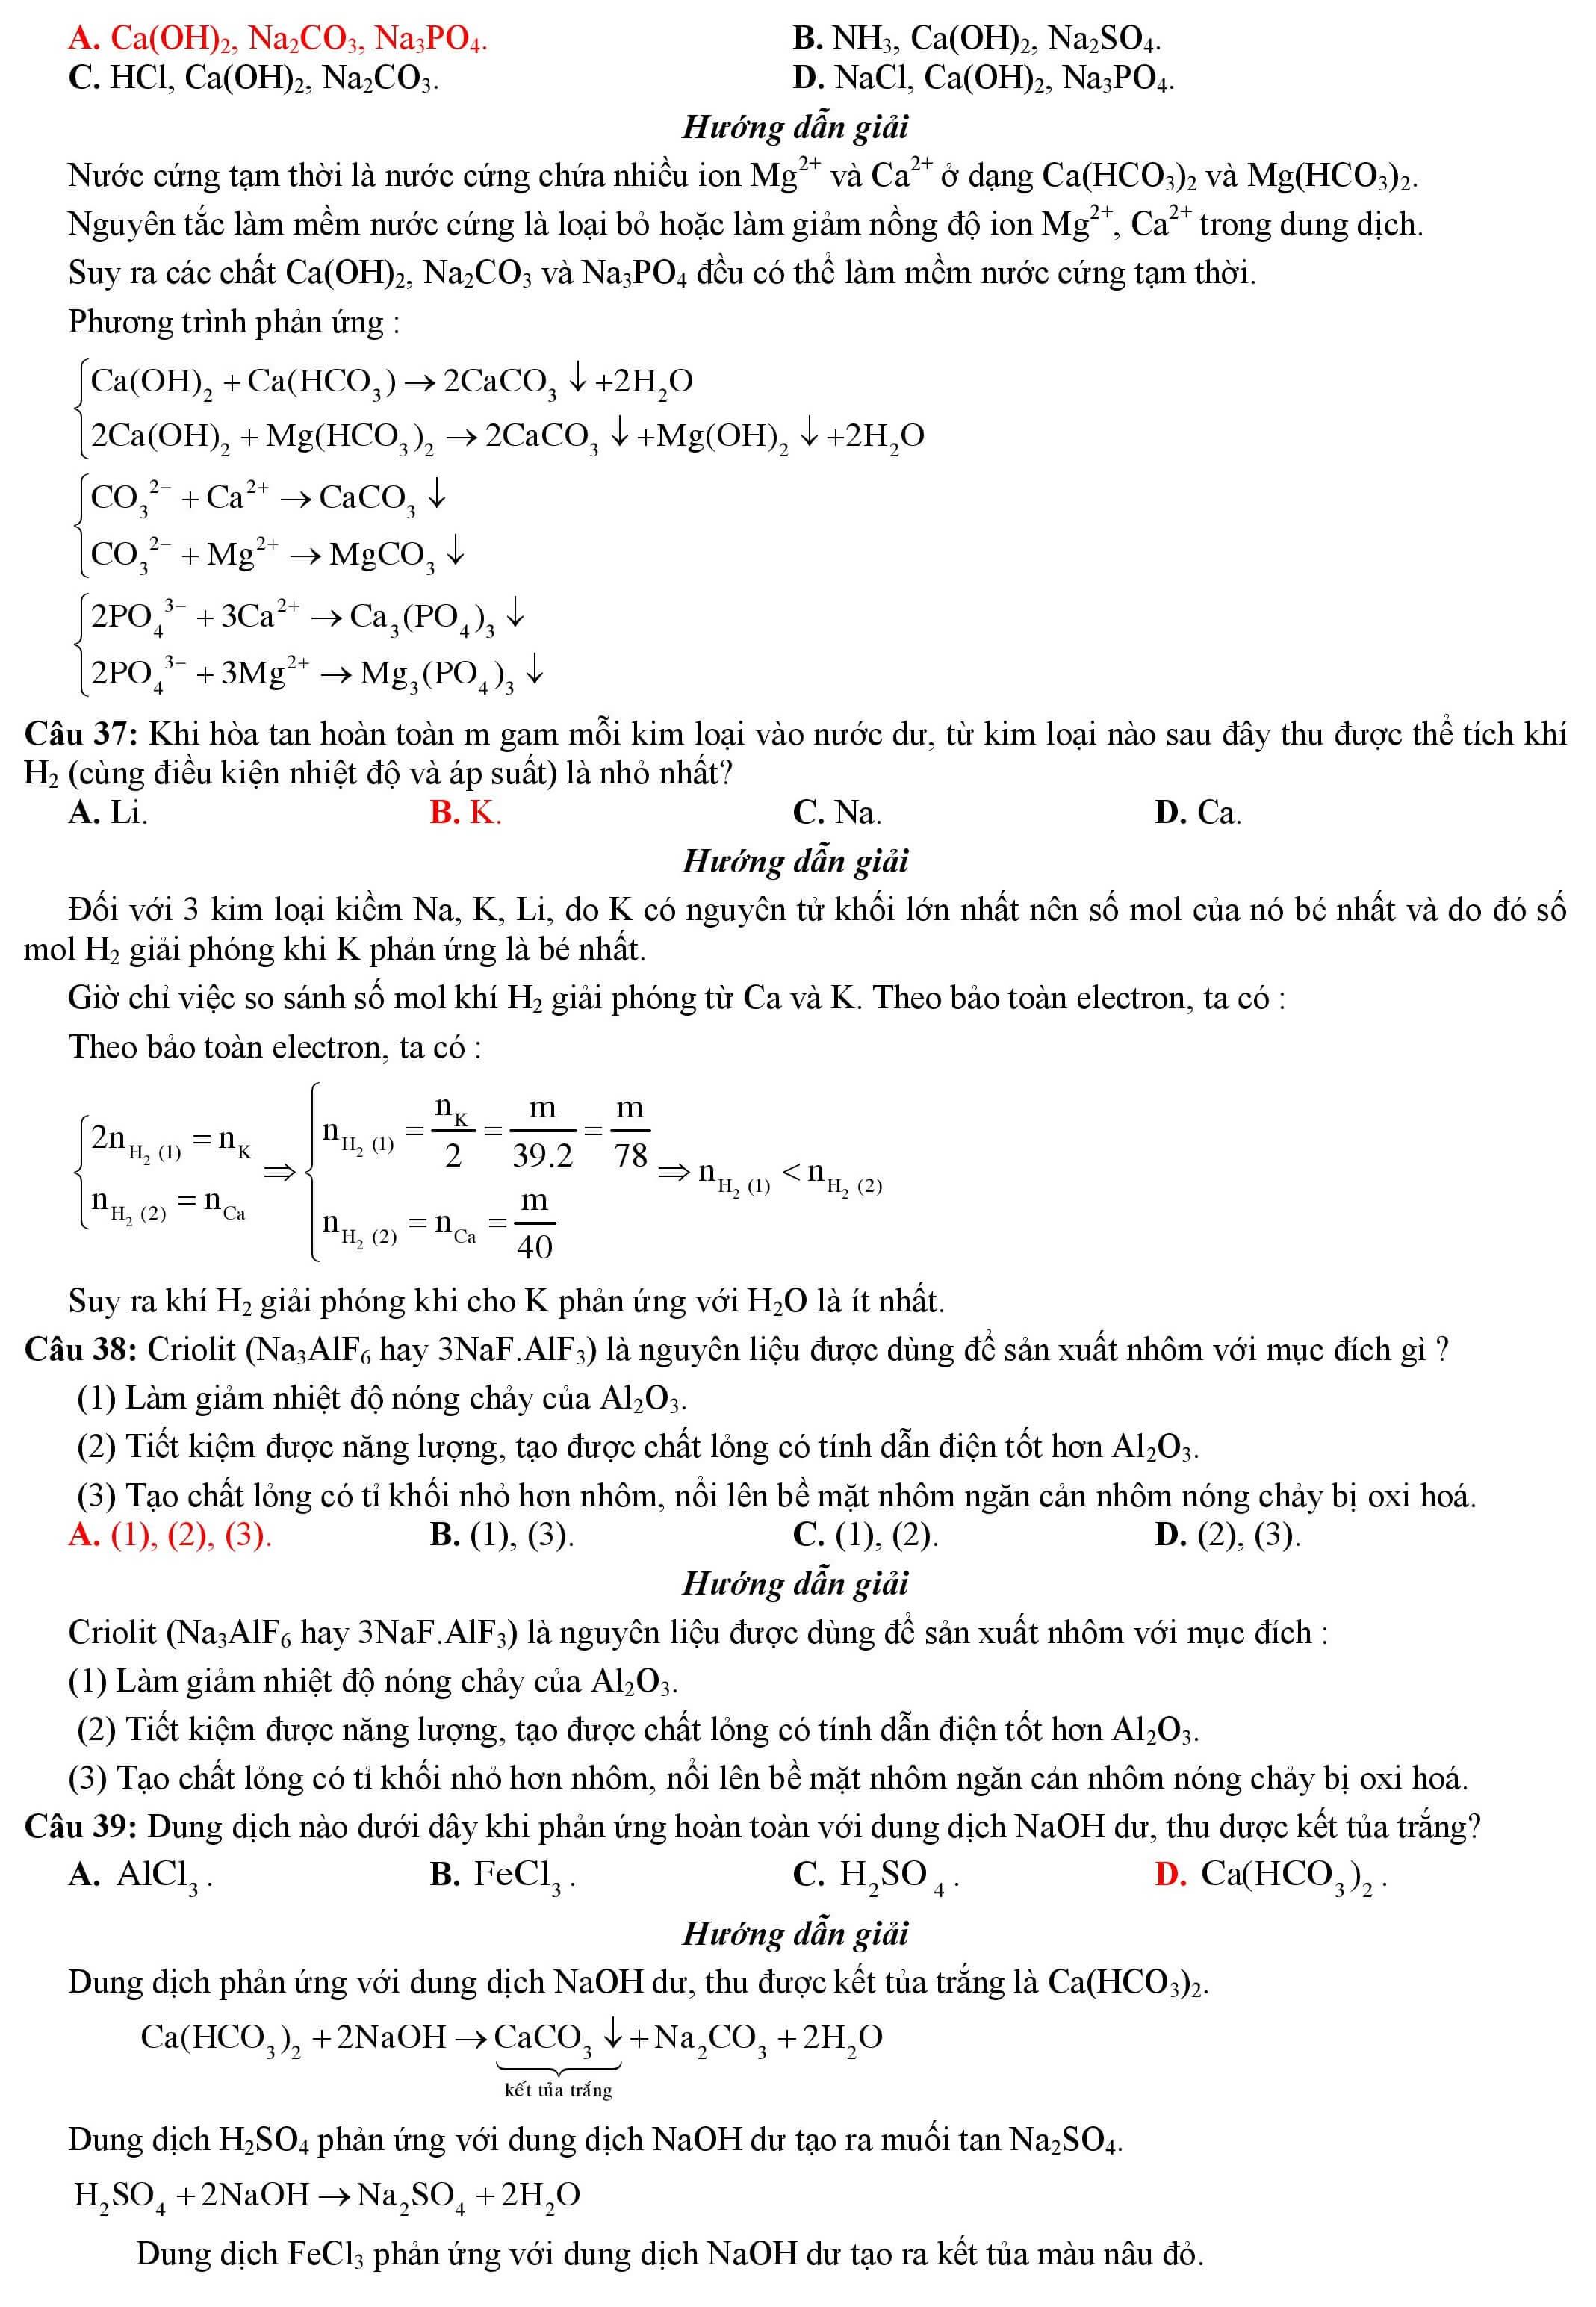 Kim loại kiềm và kim loại kiểm thổ (9).jpg